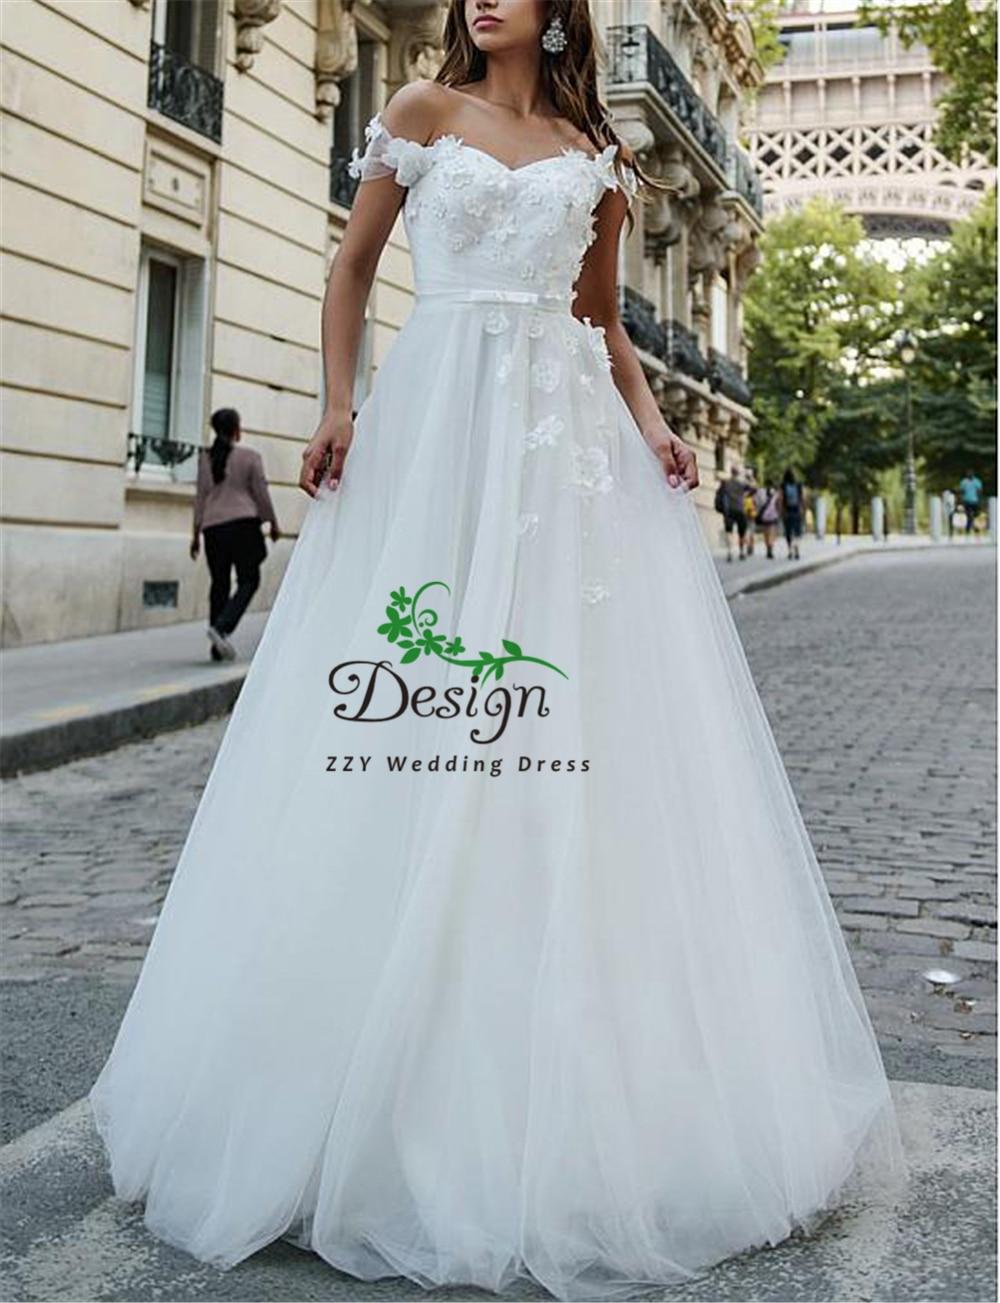 White Tulle 3D Flowers Sweetheart Neckline Illusion Princess Ball Gown Court Train Plus Size Wedding Dress Vestido Casamento